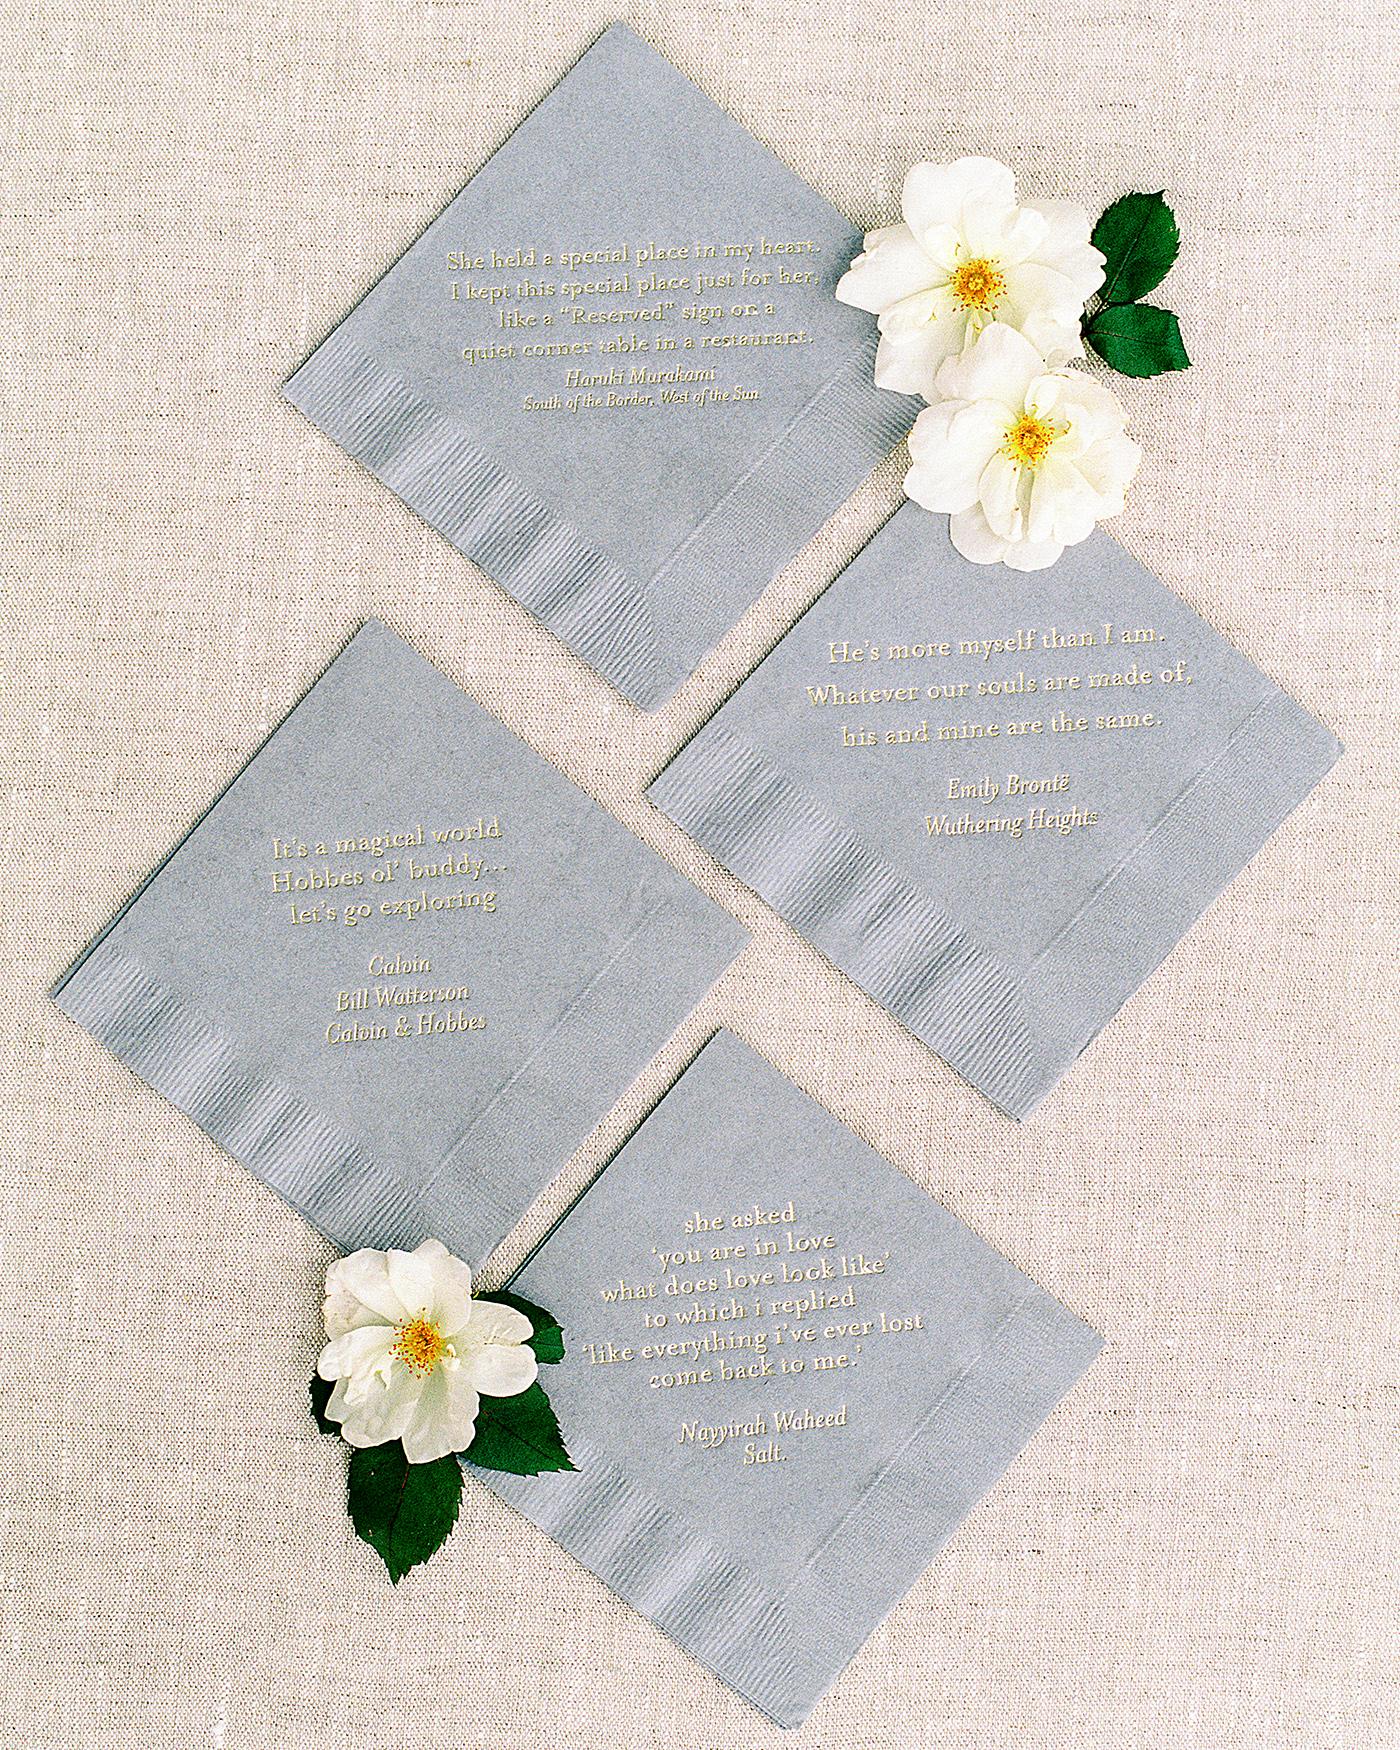 pillar paul wedding napkins with love quotes